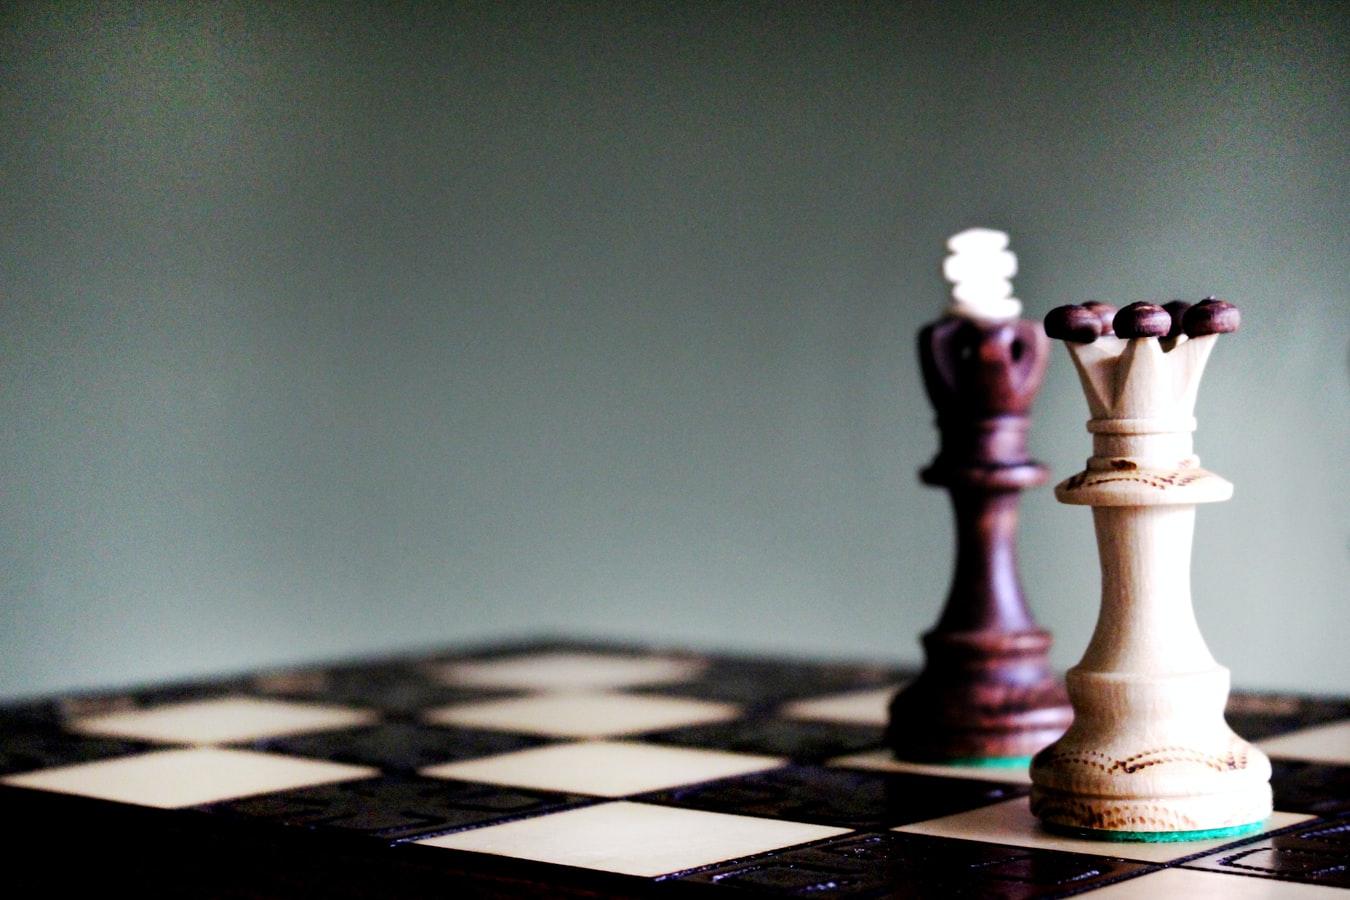 a representation of enterprise risk management